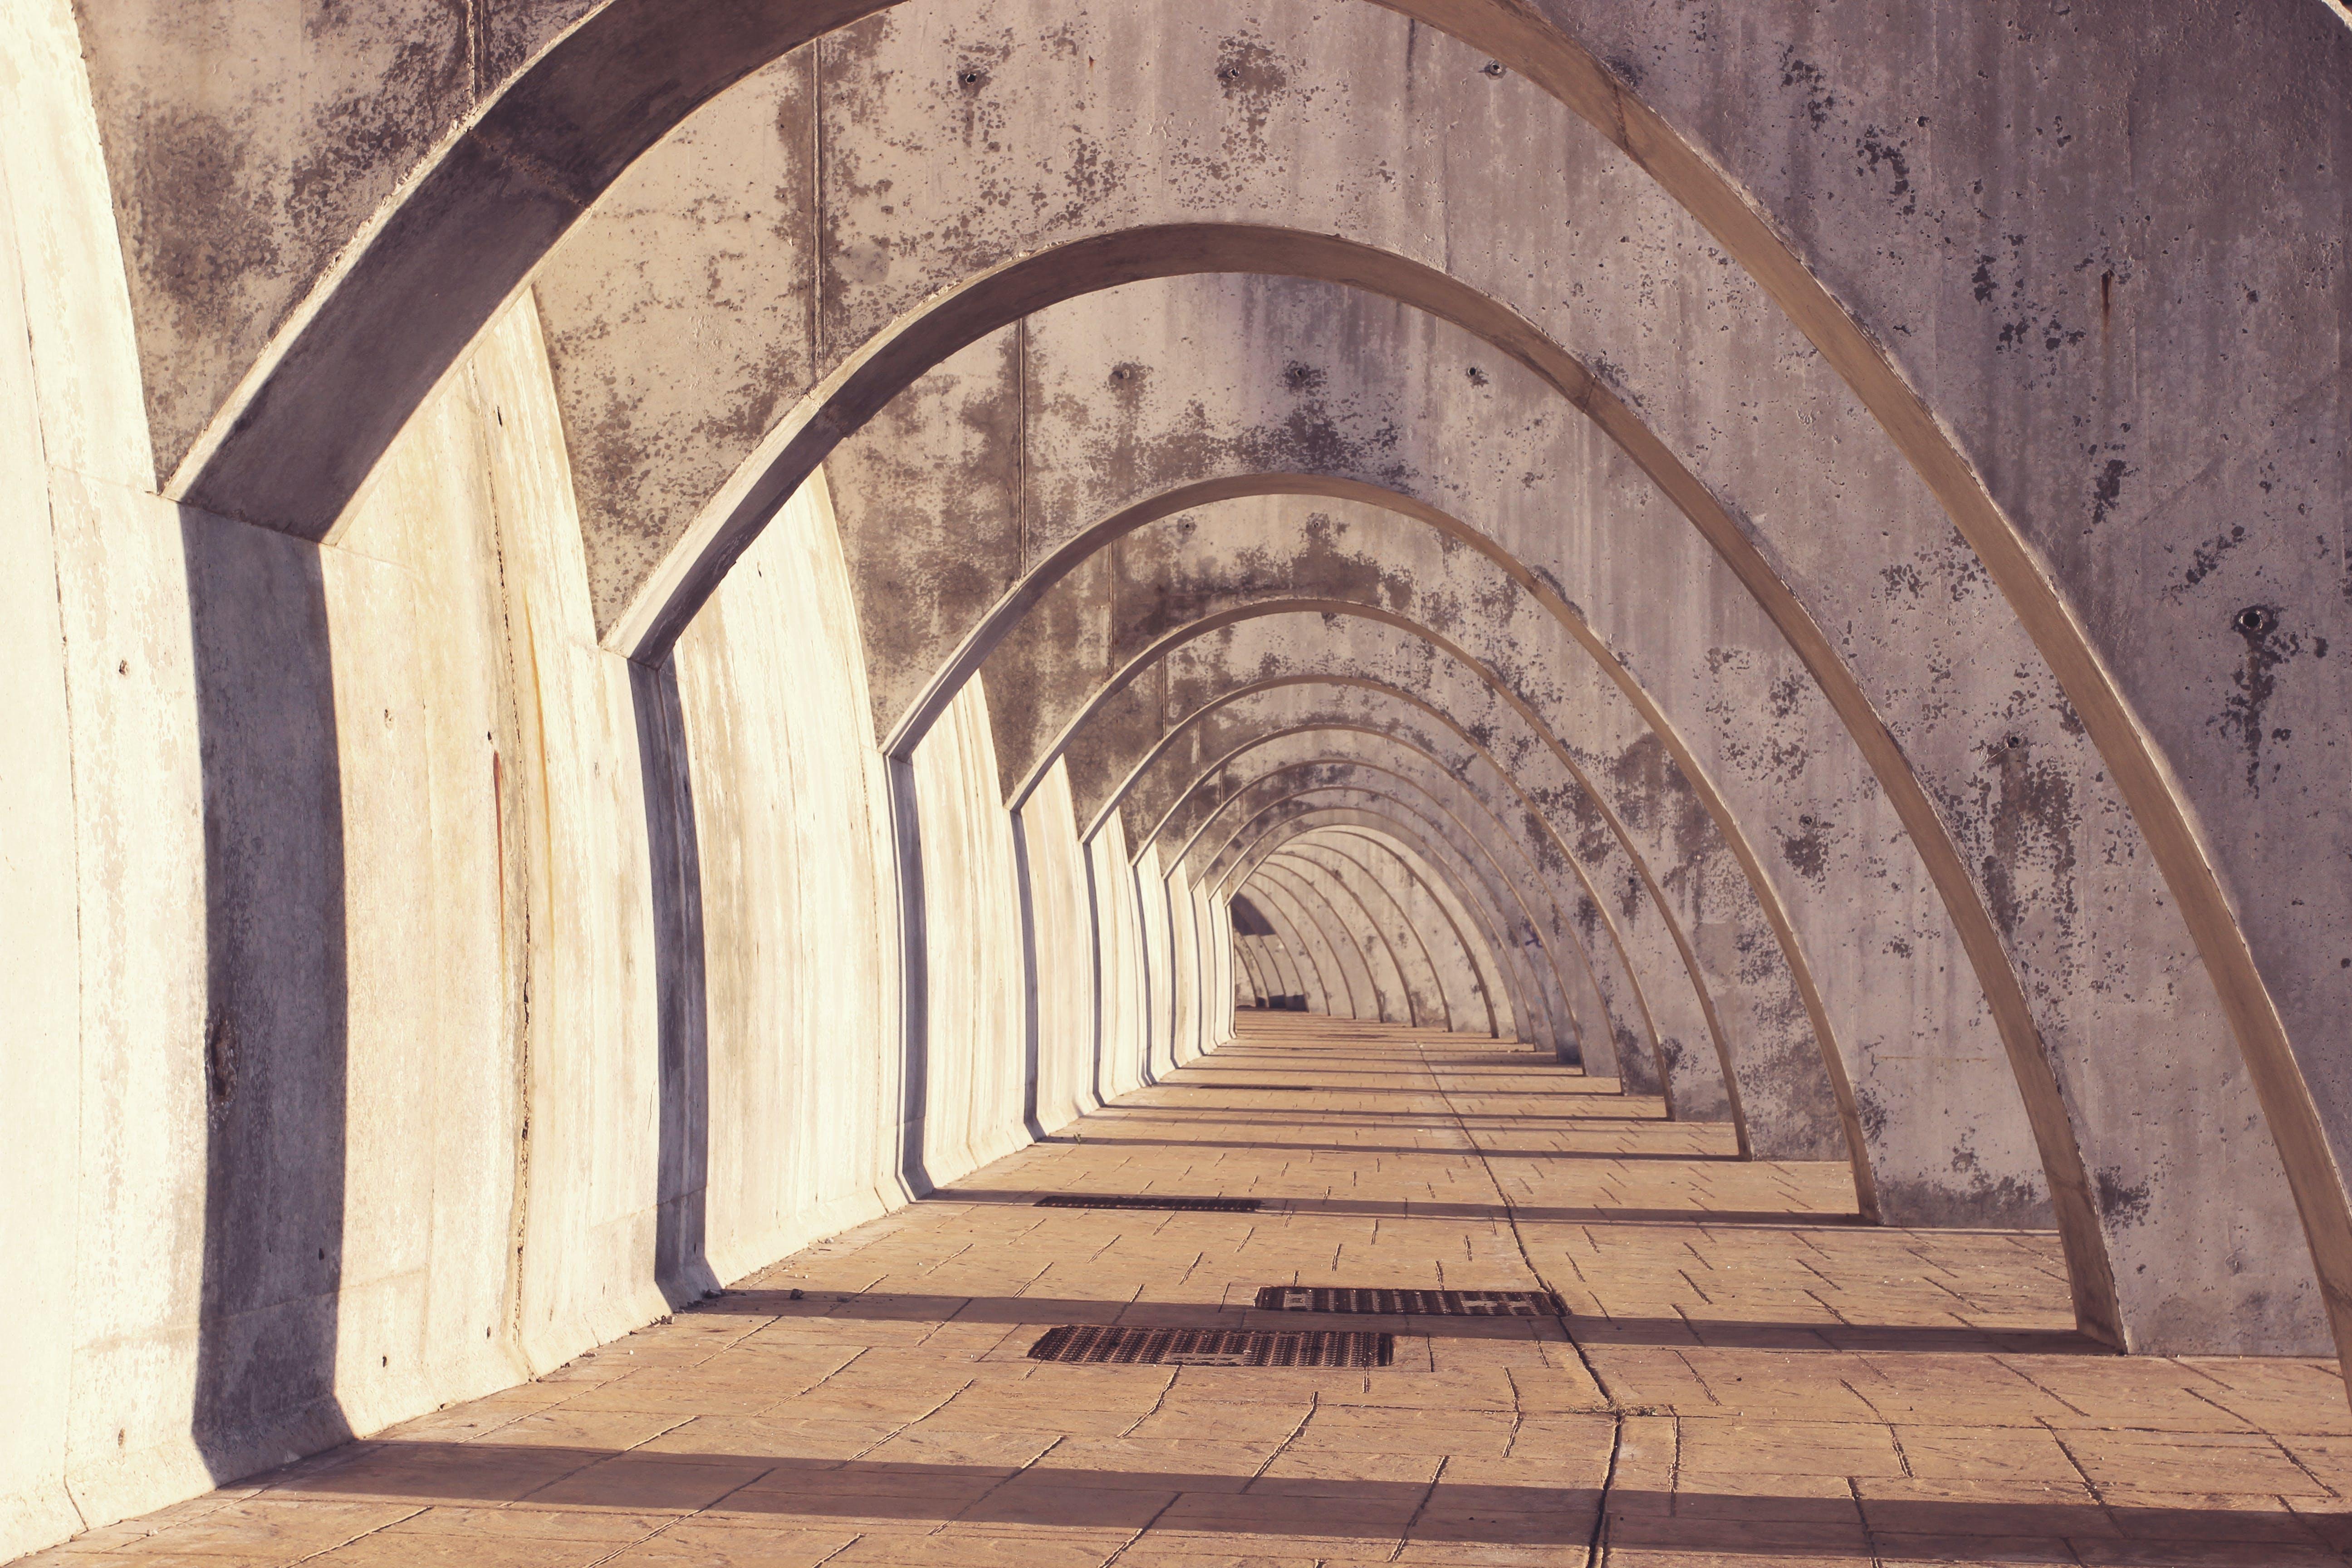 Photograph of a Concrete Structure